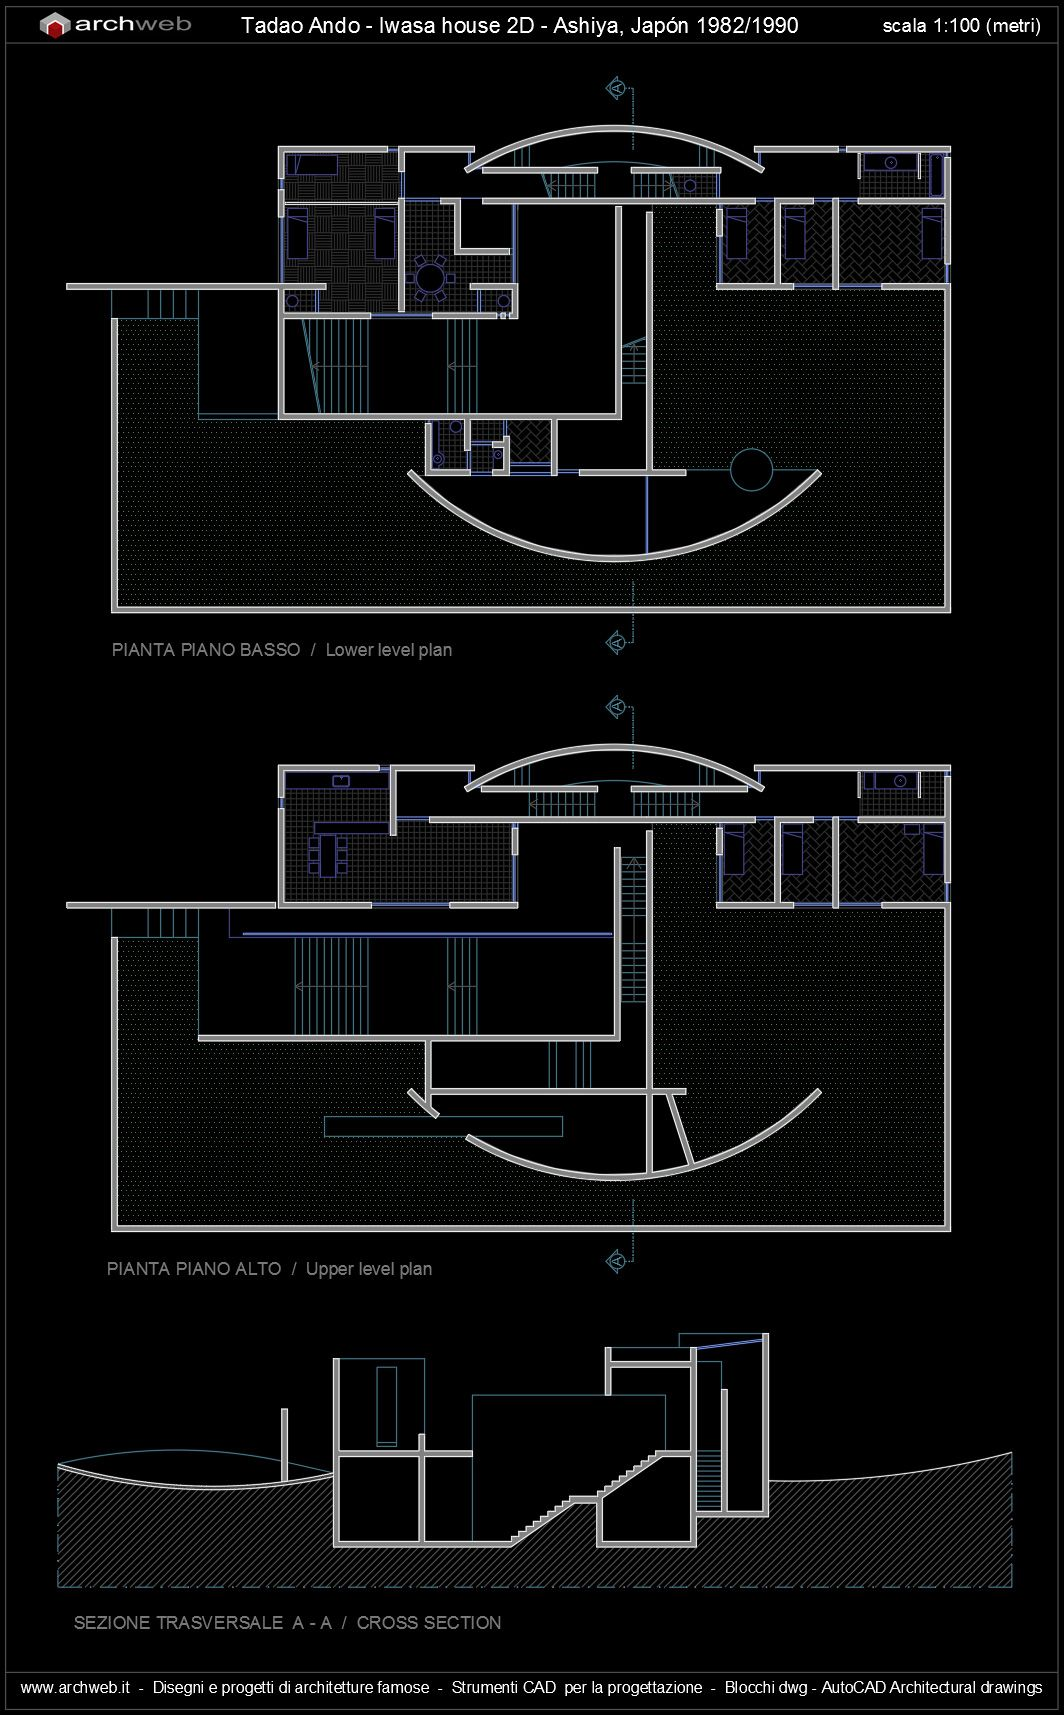 Autocad 3d House Design Software: Iwasa House, Ashiya Japan (1982-1990)